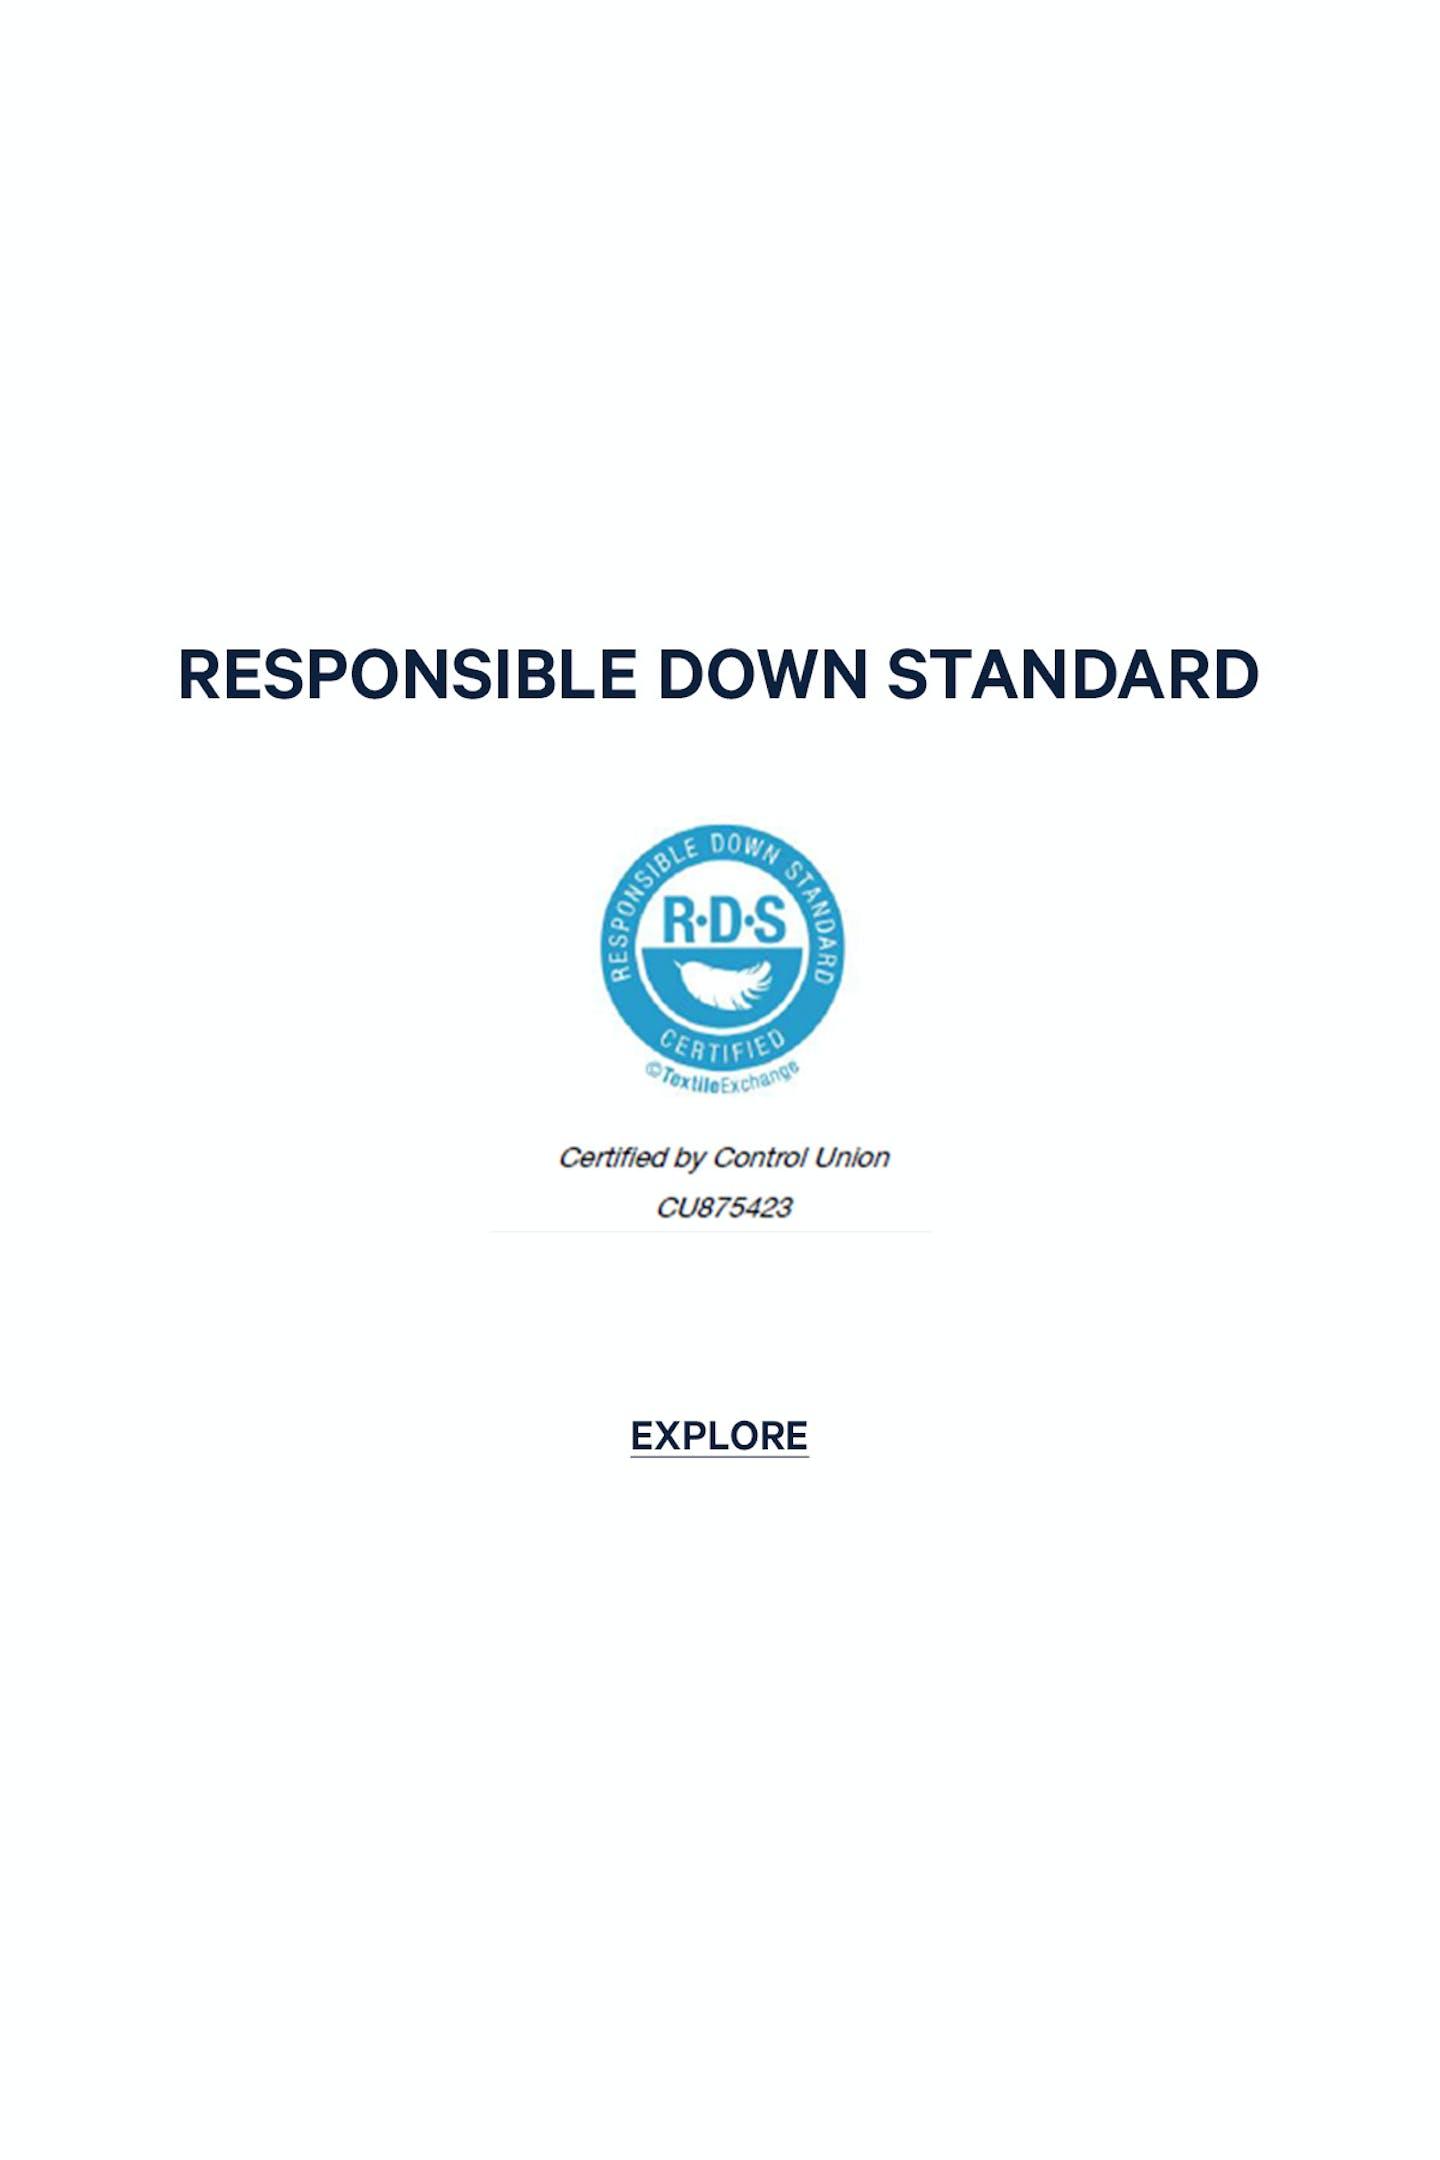 RESPONSIBLE DOWN STANDARD